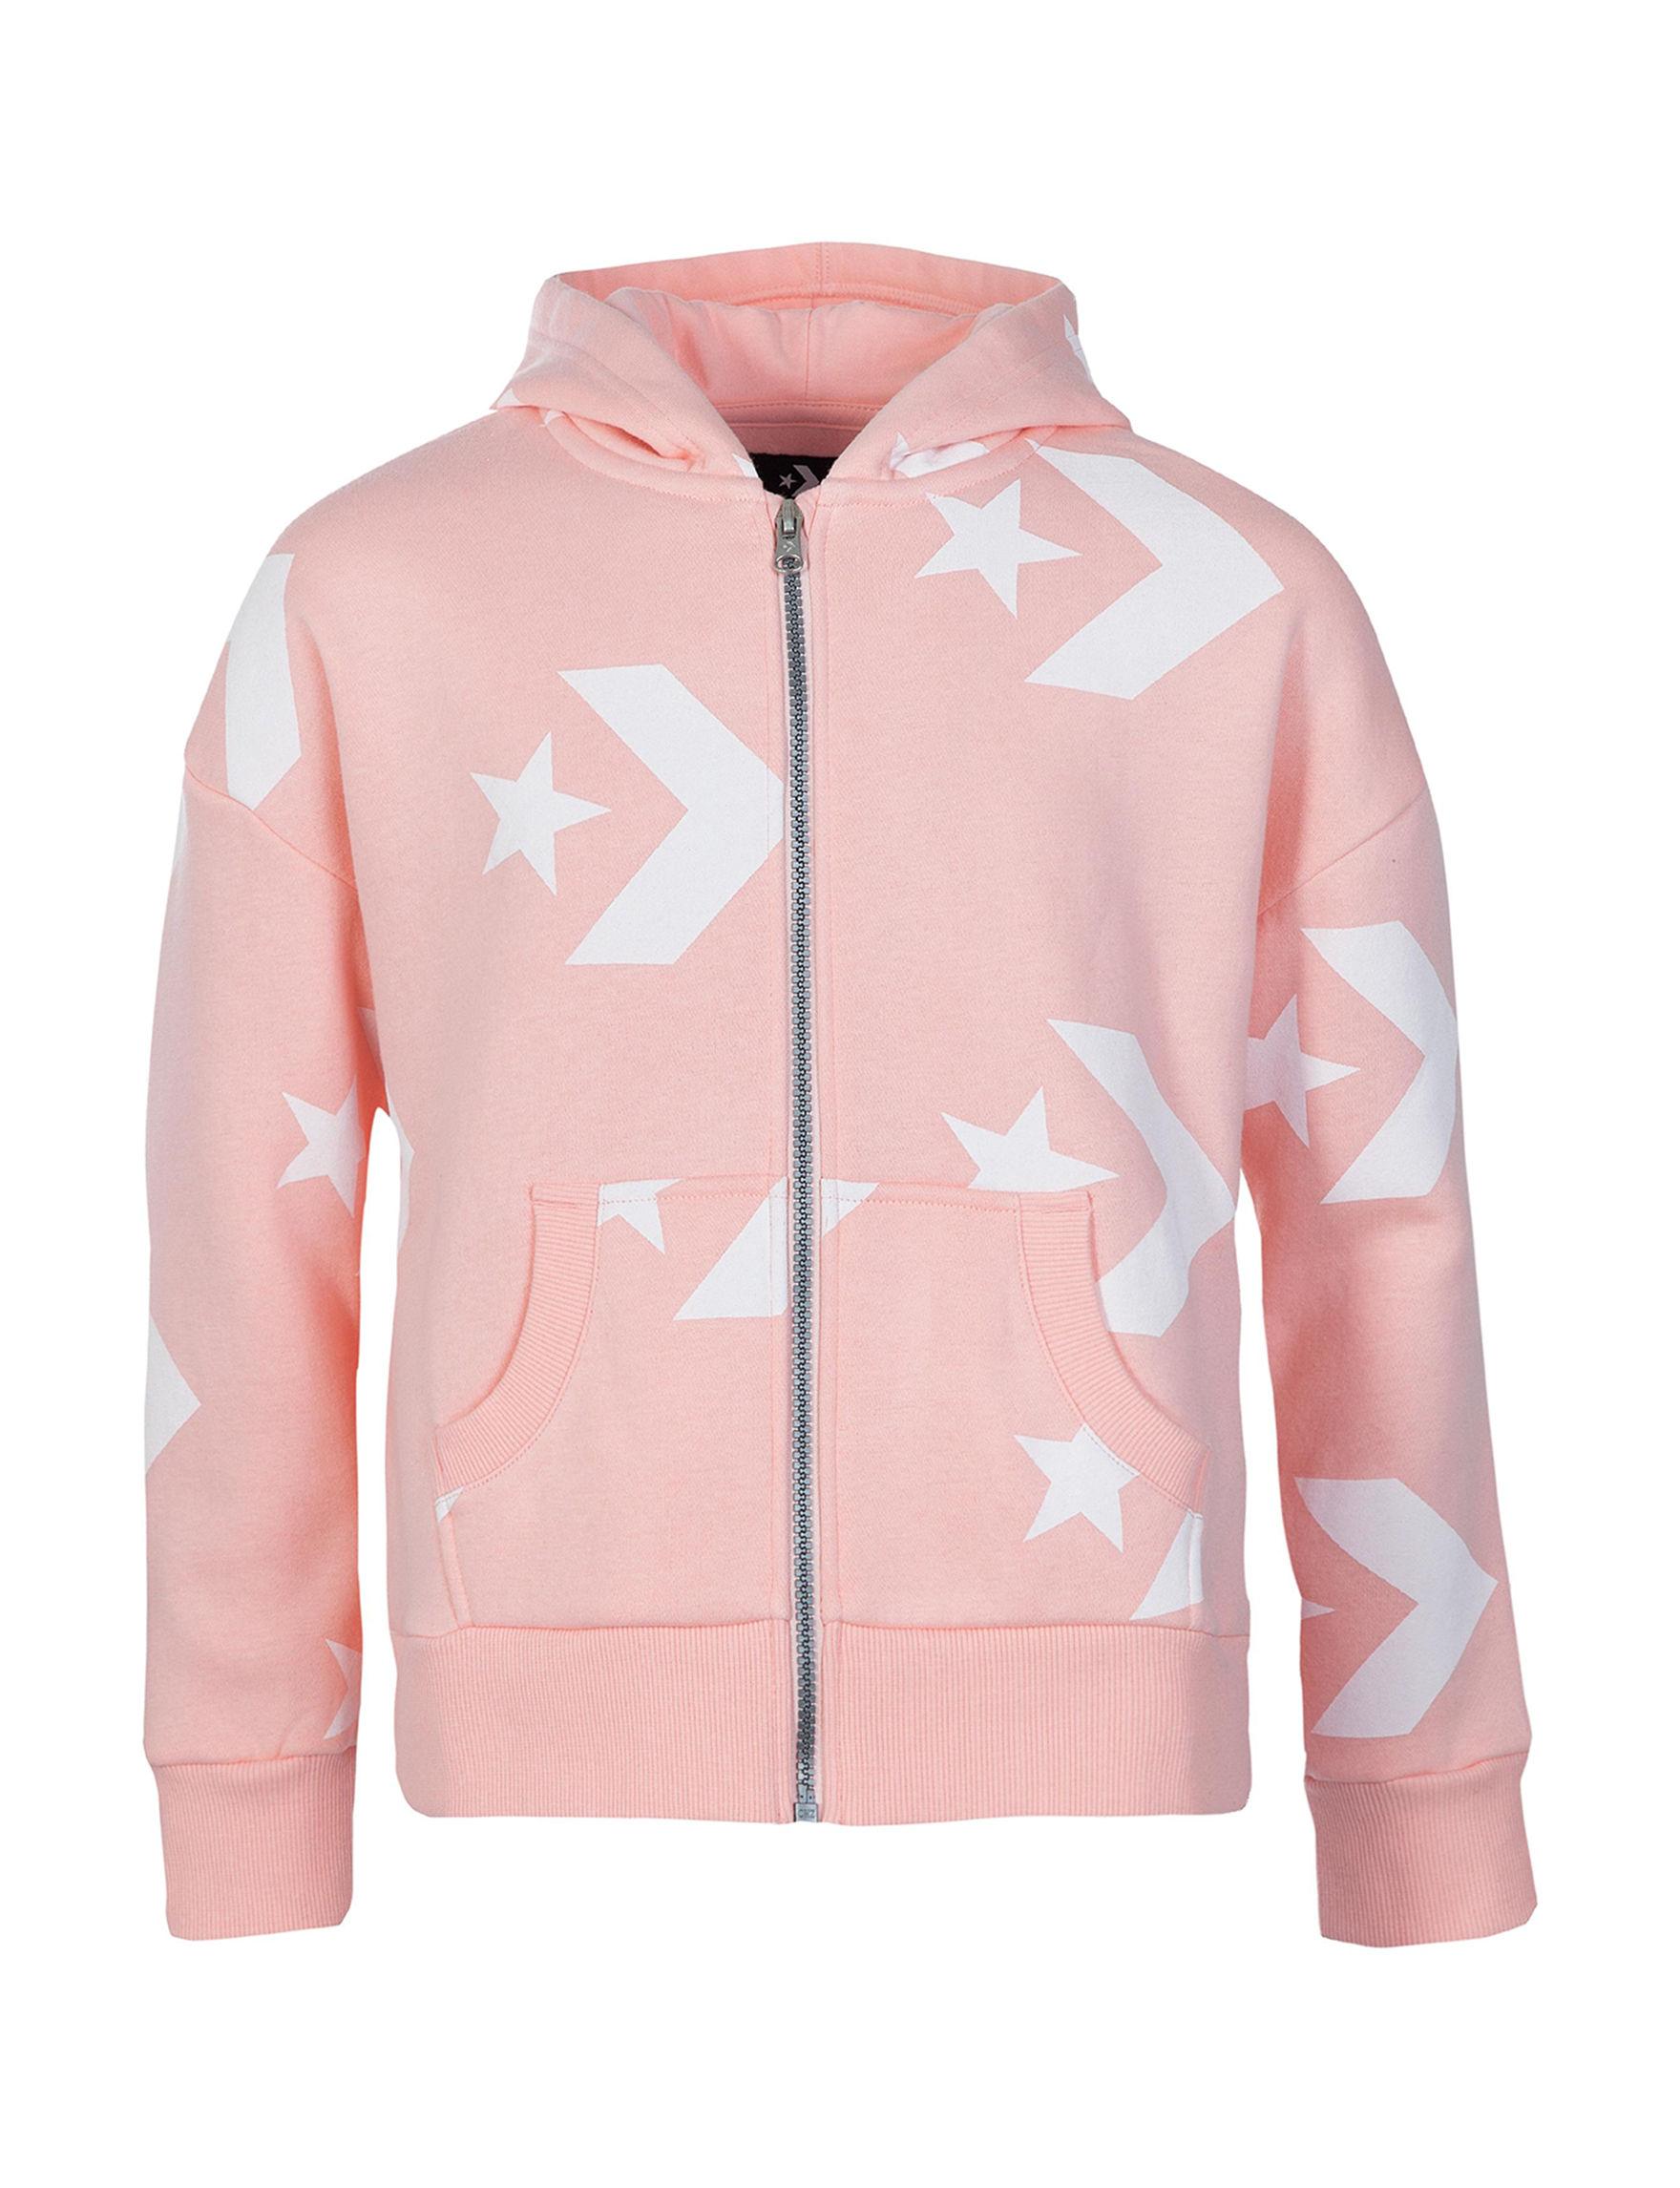 Converse Pink / White